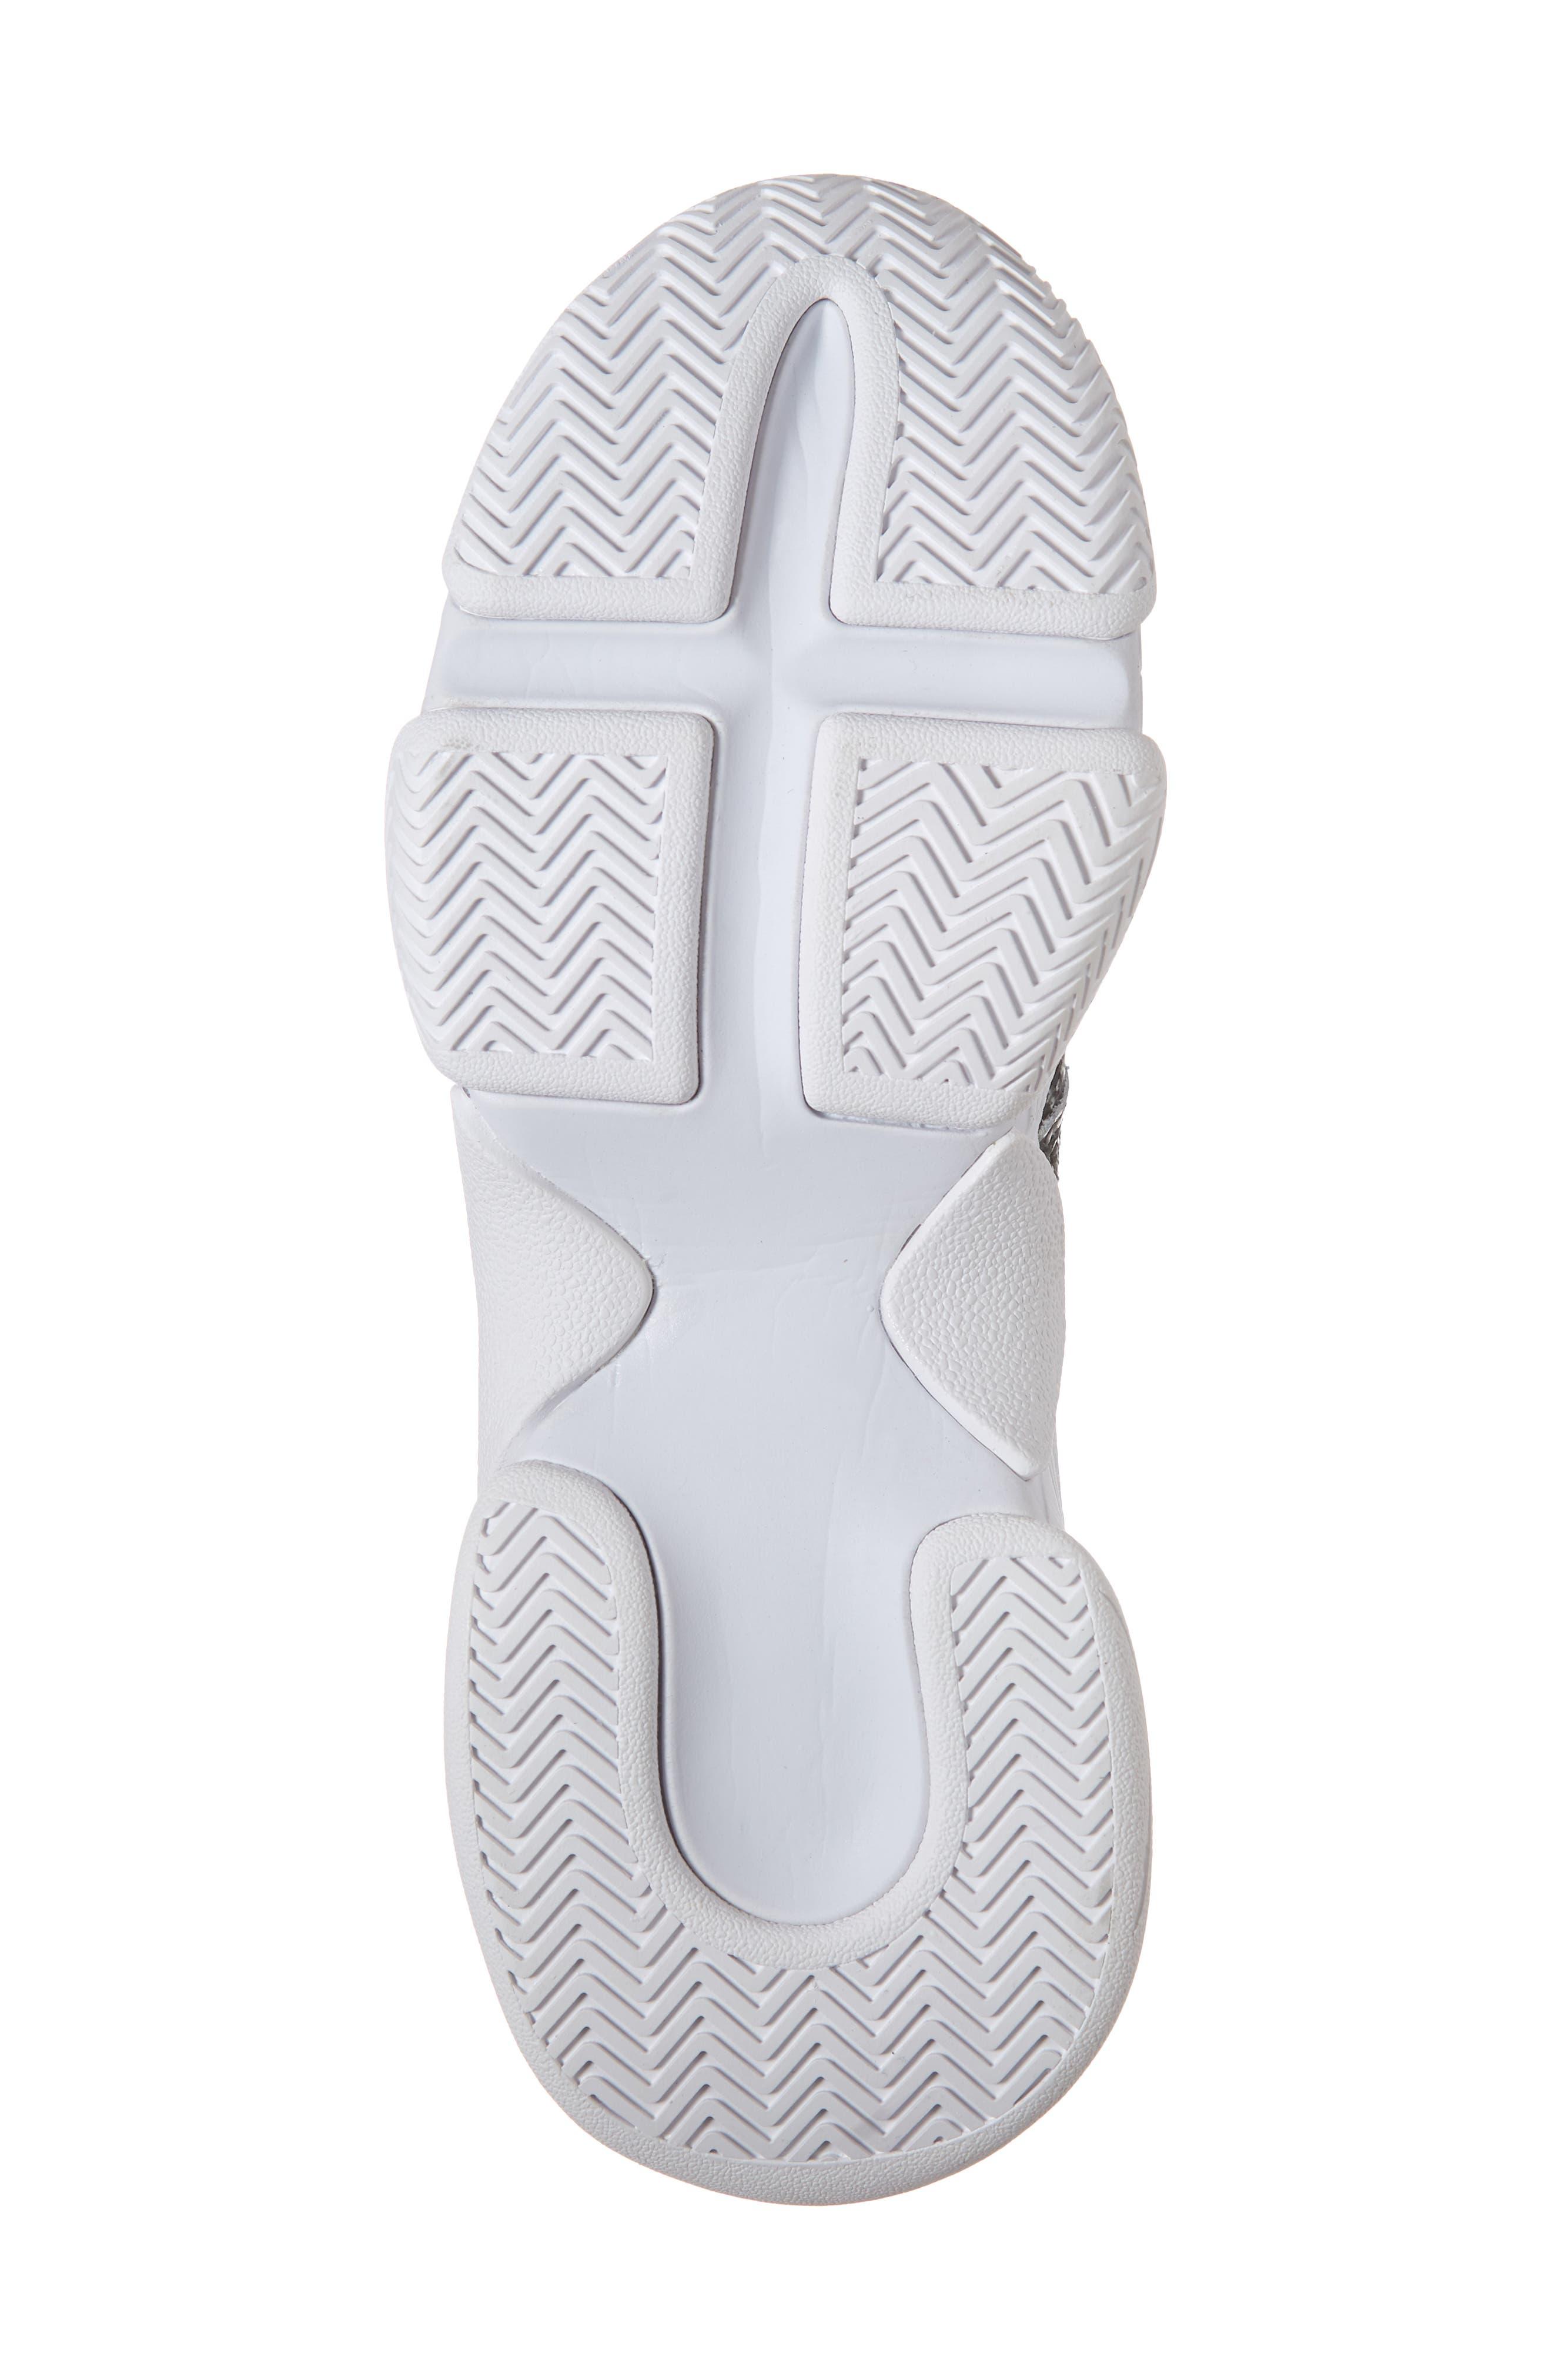 CTRL-DEL Sneaker,                             Alternate thumbnail 6, color,                             GREY BLACK SNAKE